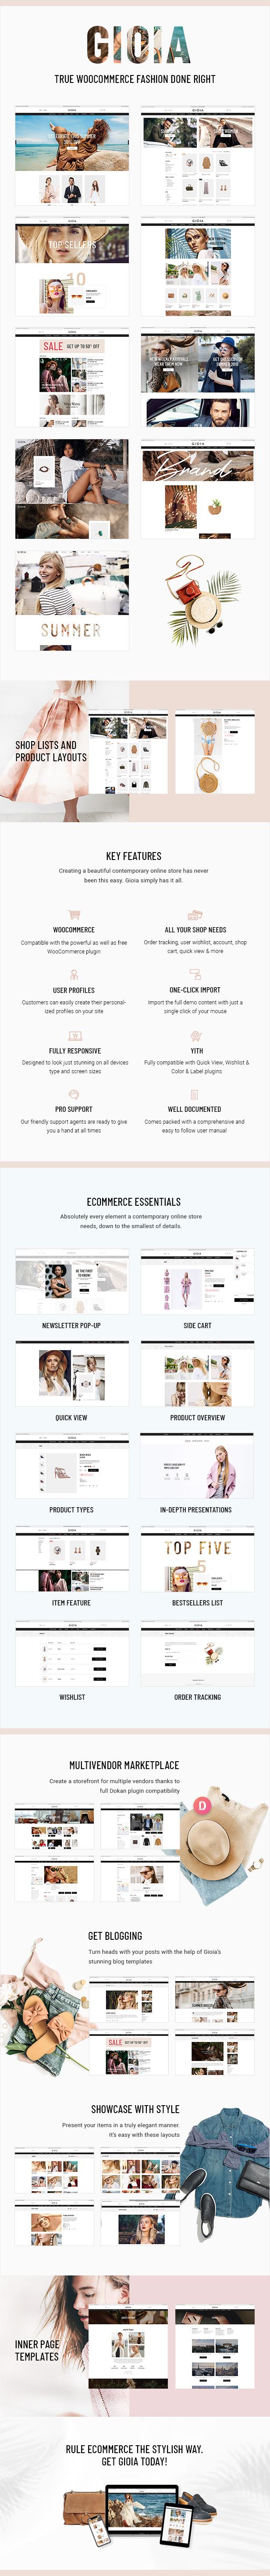 Gioia - Modern Fashion Shop - 1